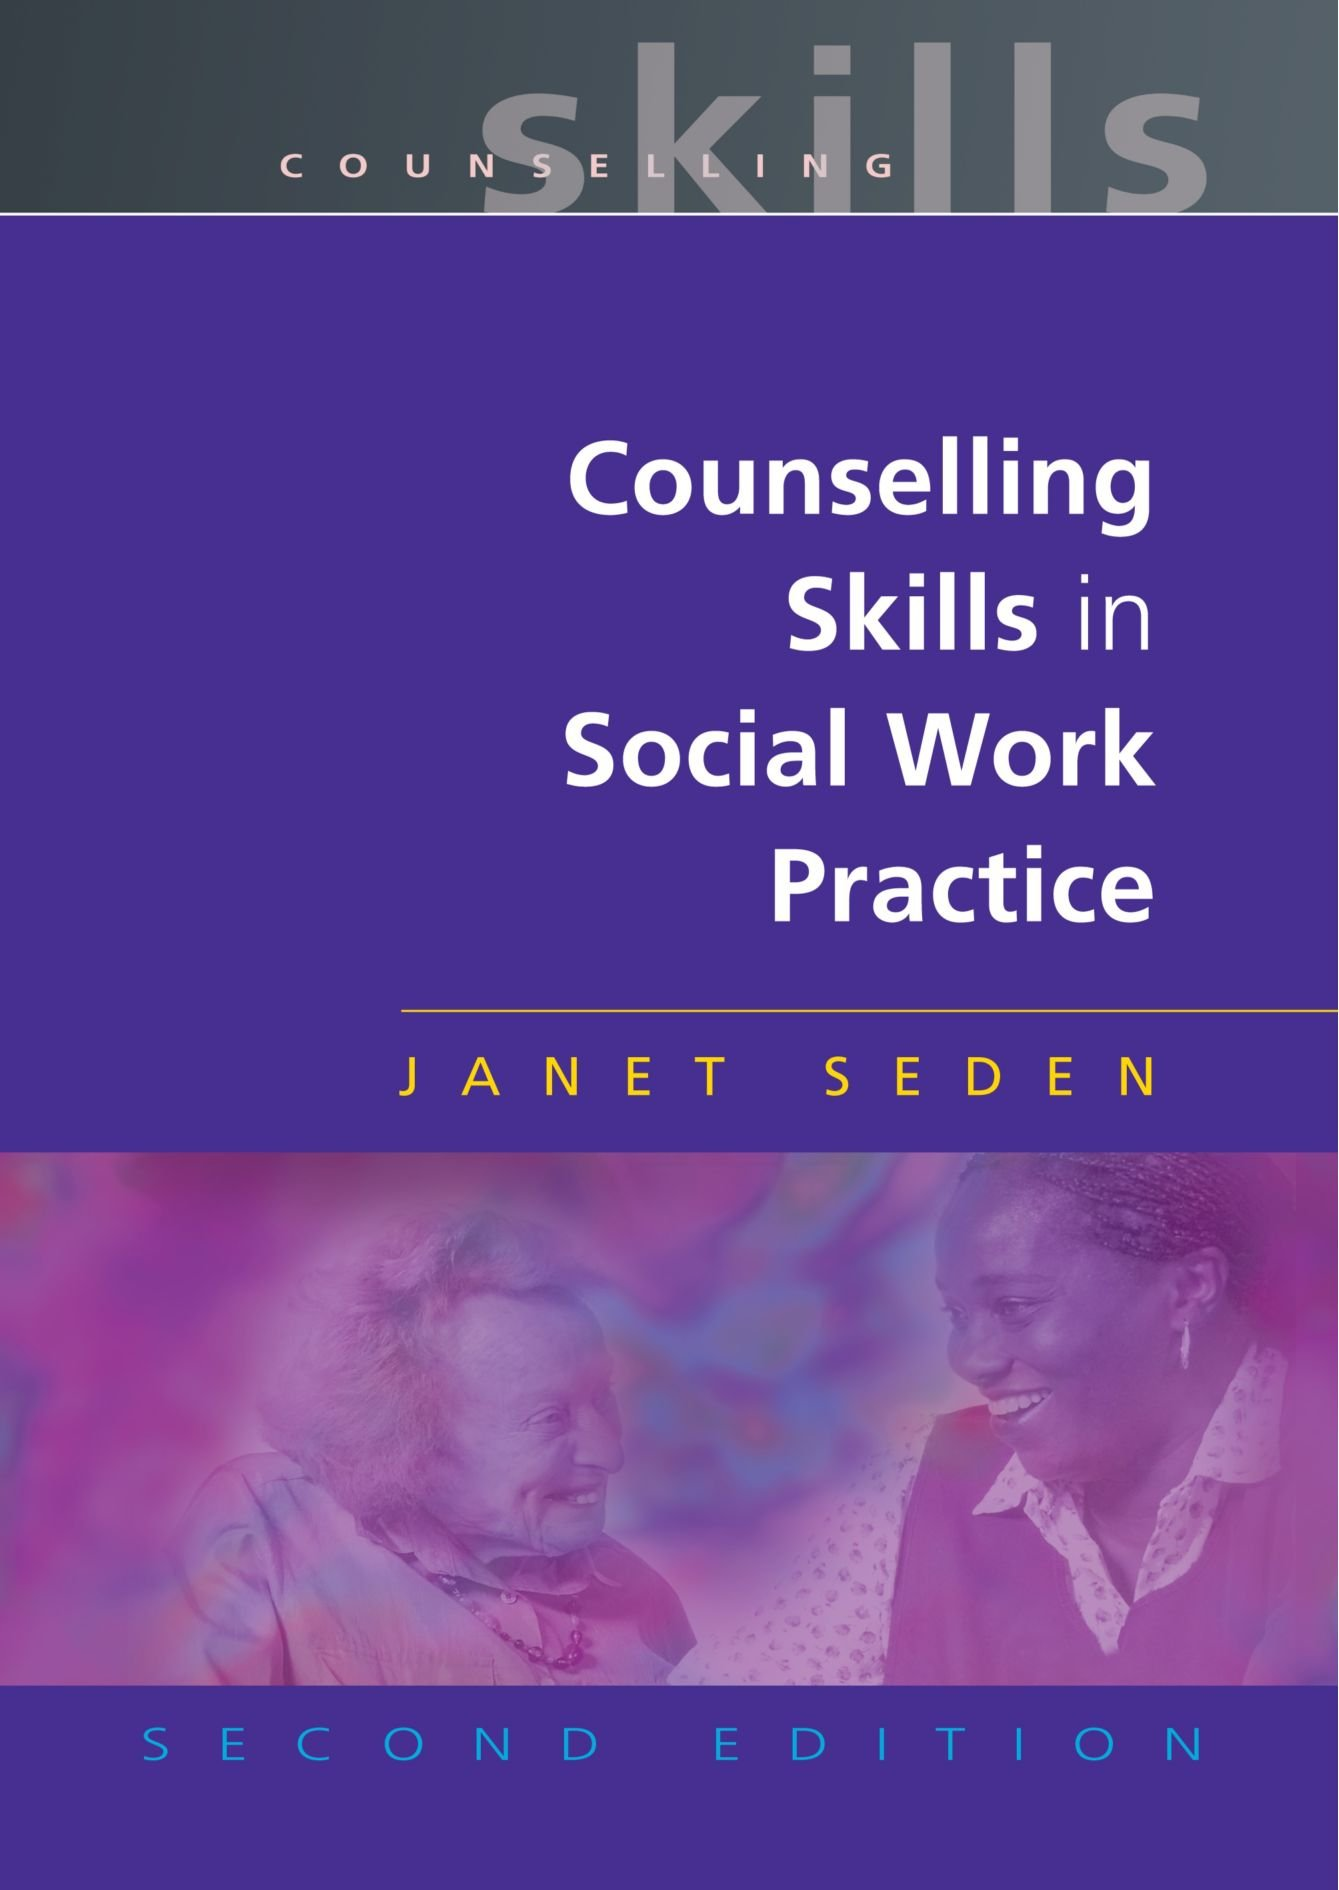 Seden, J. (2005) Counselling Skills in Social Work Practice, Basingstoke: Palgrave Macmillan.